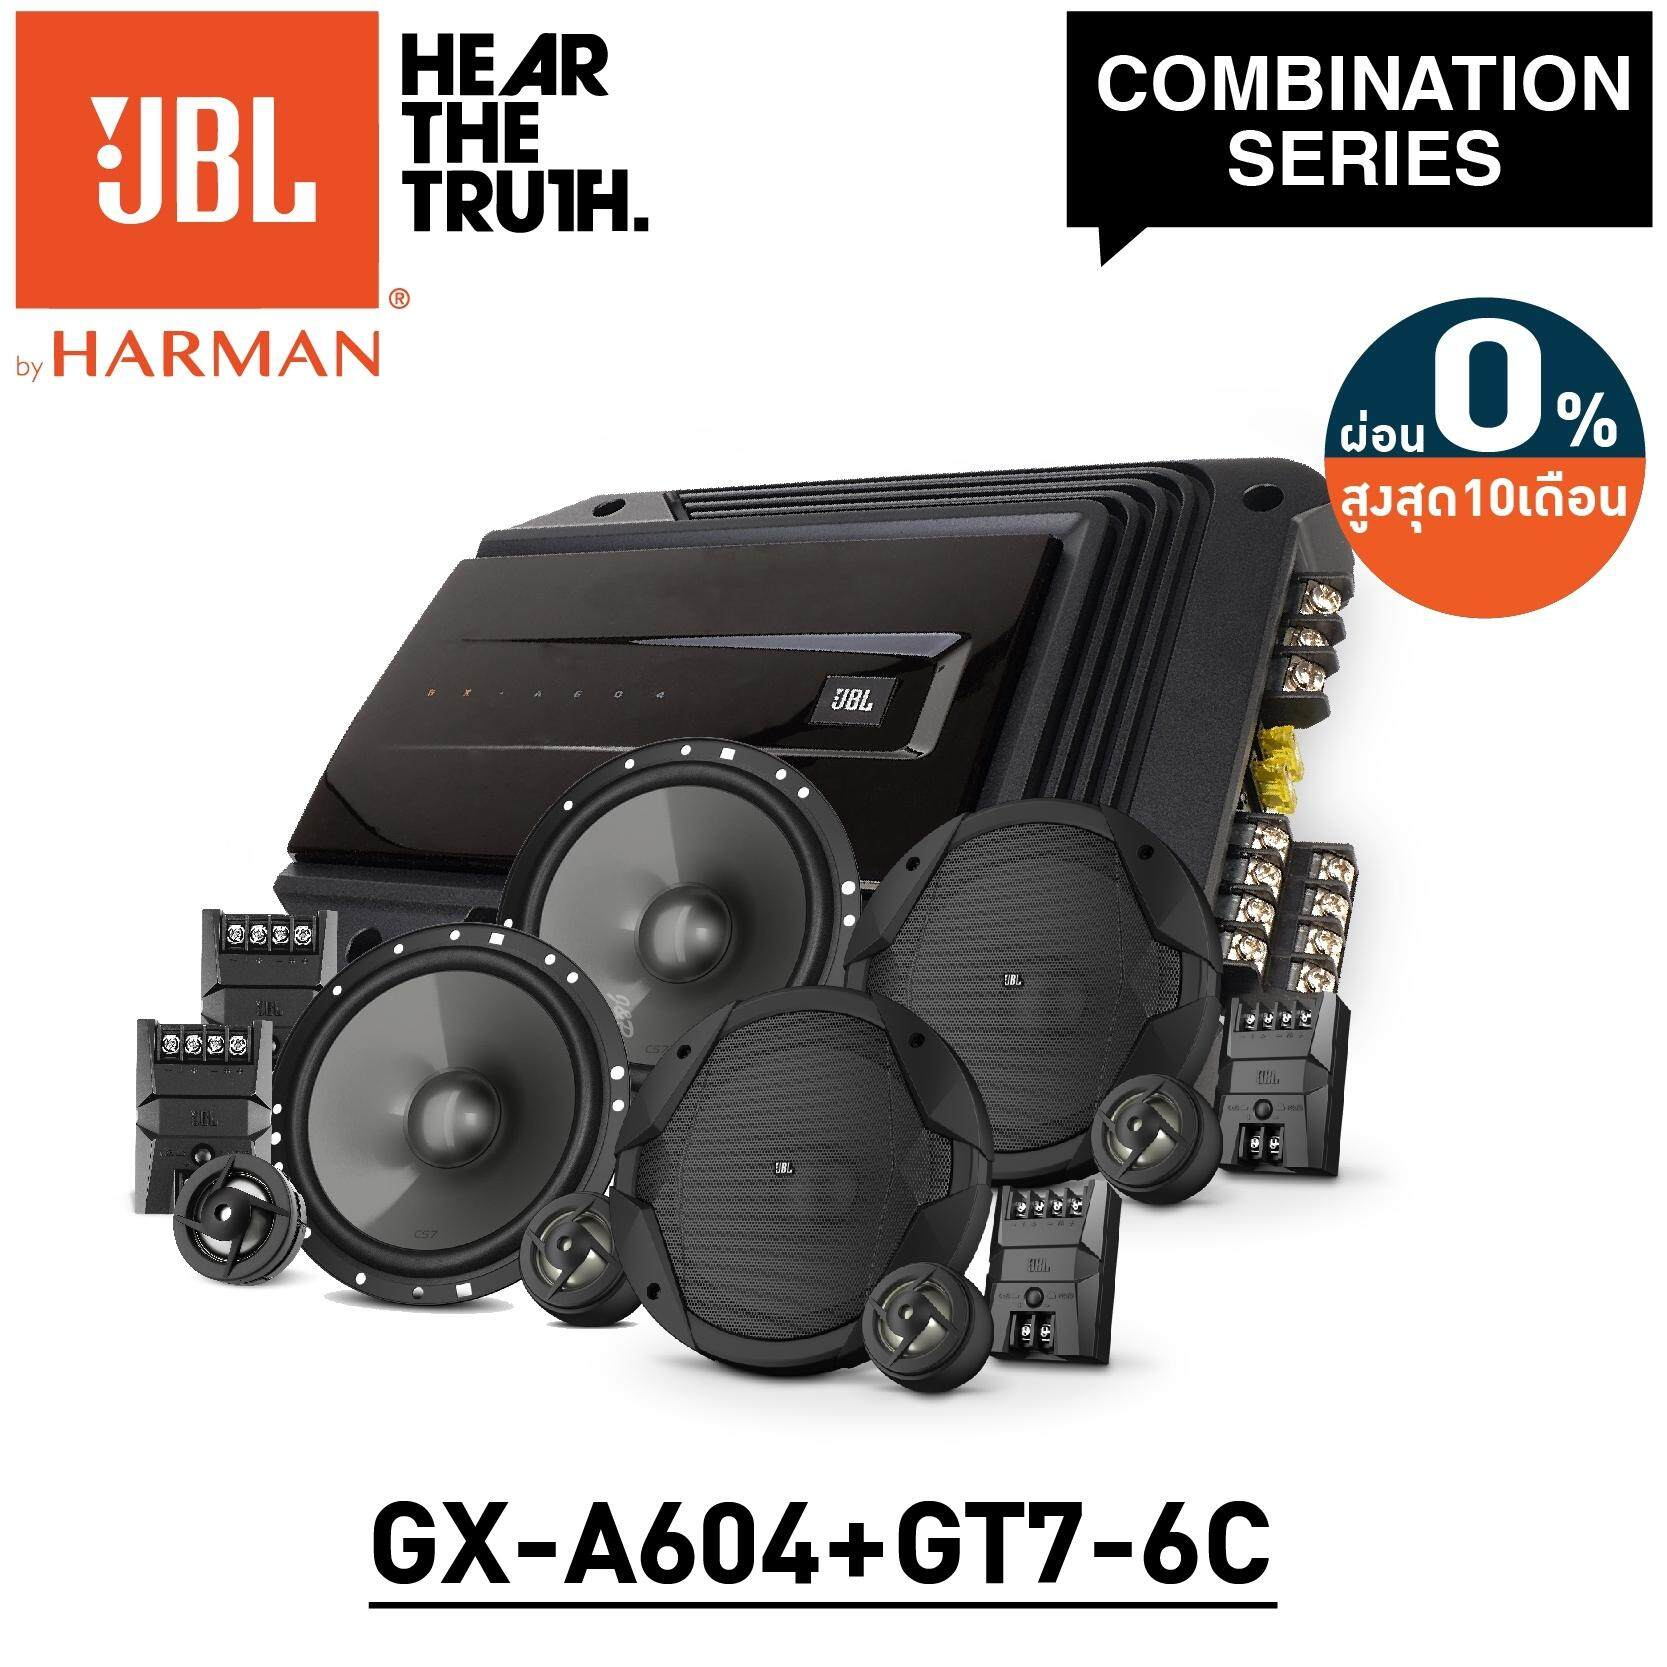 JBL COMBINATION SERIES GX-A604 เพาเวอร์แอมป์ CLASS AB 4ชาแนล + GT7-6C ลำโพงแยกชิ้นติดรถยนต์ 6.5นิ้ว 2คู่